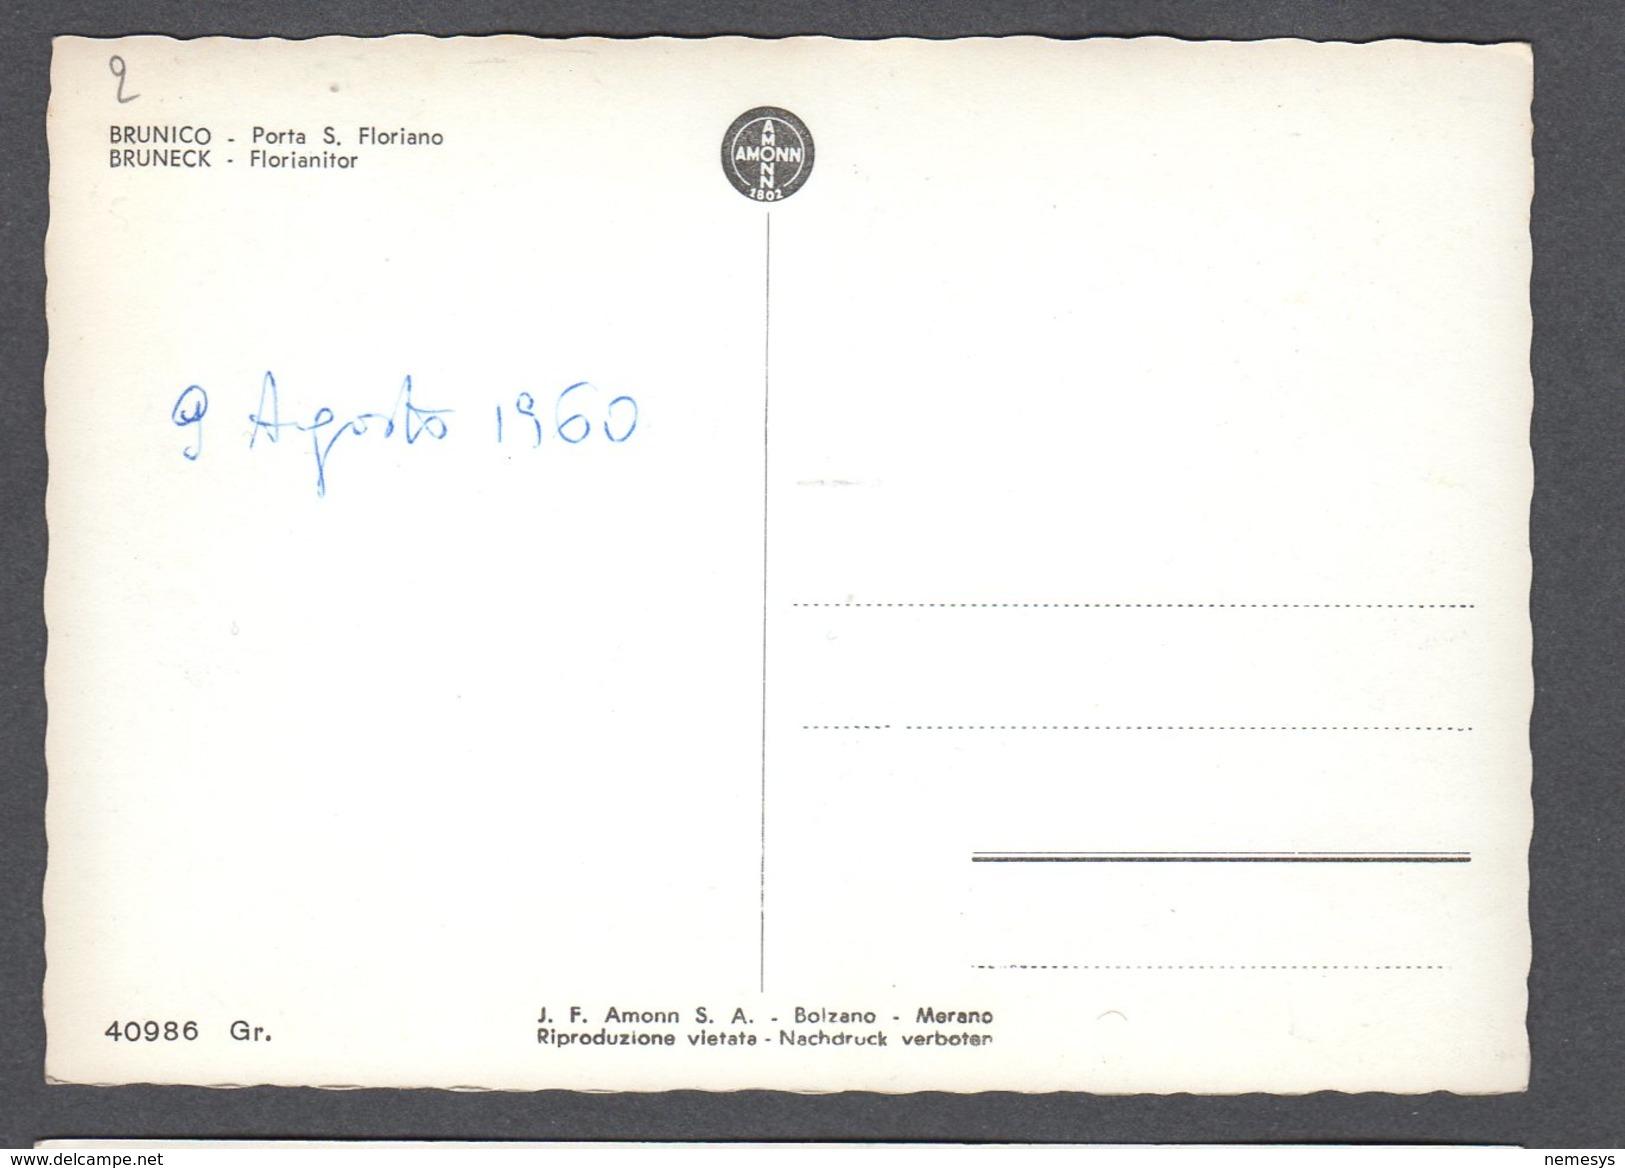 1960 BRUNICO BRUNECK PORTA SAN FLORIANO FG NV SEE 2 SCANS ANIMATA GIORNALAIO GELATI DROGERIE ZIEGLAUER - Italia